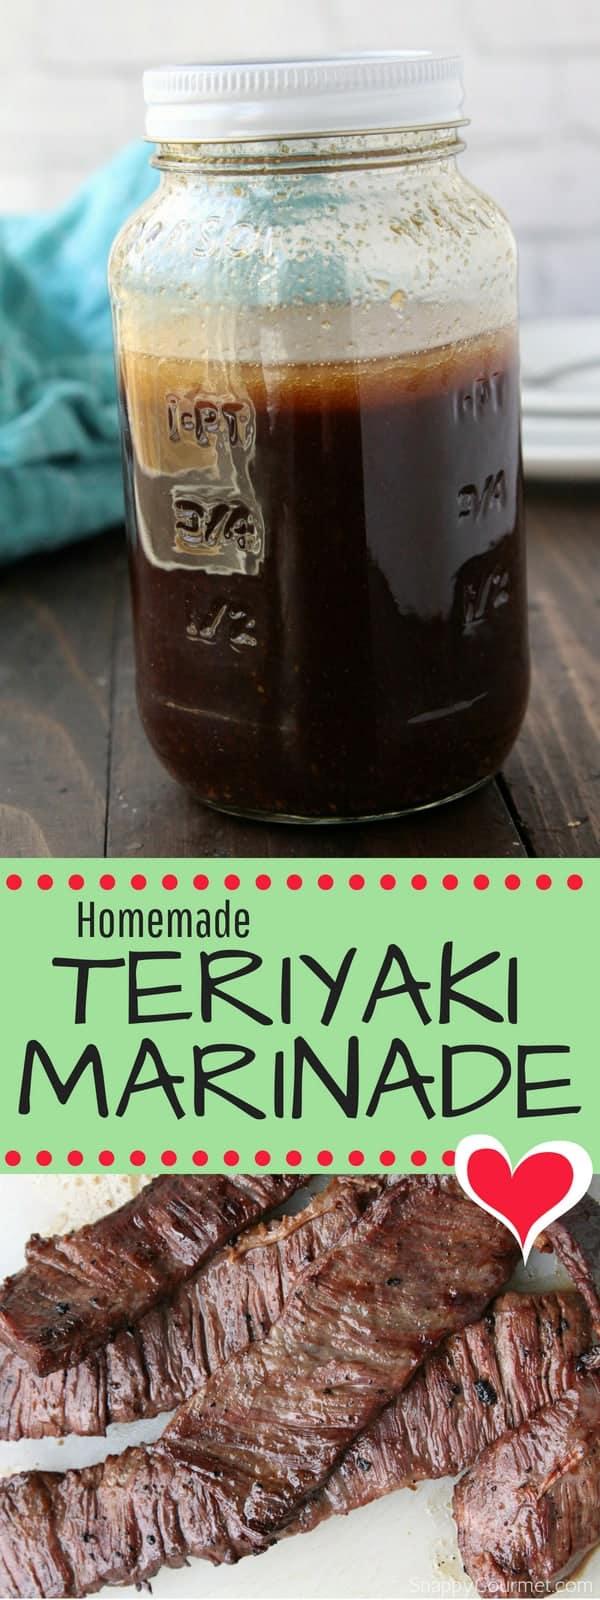 Homemade Teriyaki Marinade recipe, a quick an easy marinade for chicken, steak, or pork. Learn how to make teriyaki marinade in no time! #Teriyaki #Marinade #Recipe #SnappyGourmet #Asian #Steak #Beef #Pork #Chicken